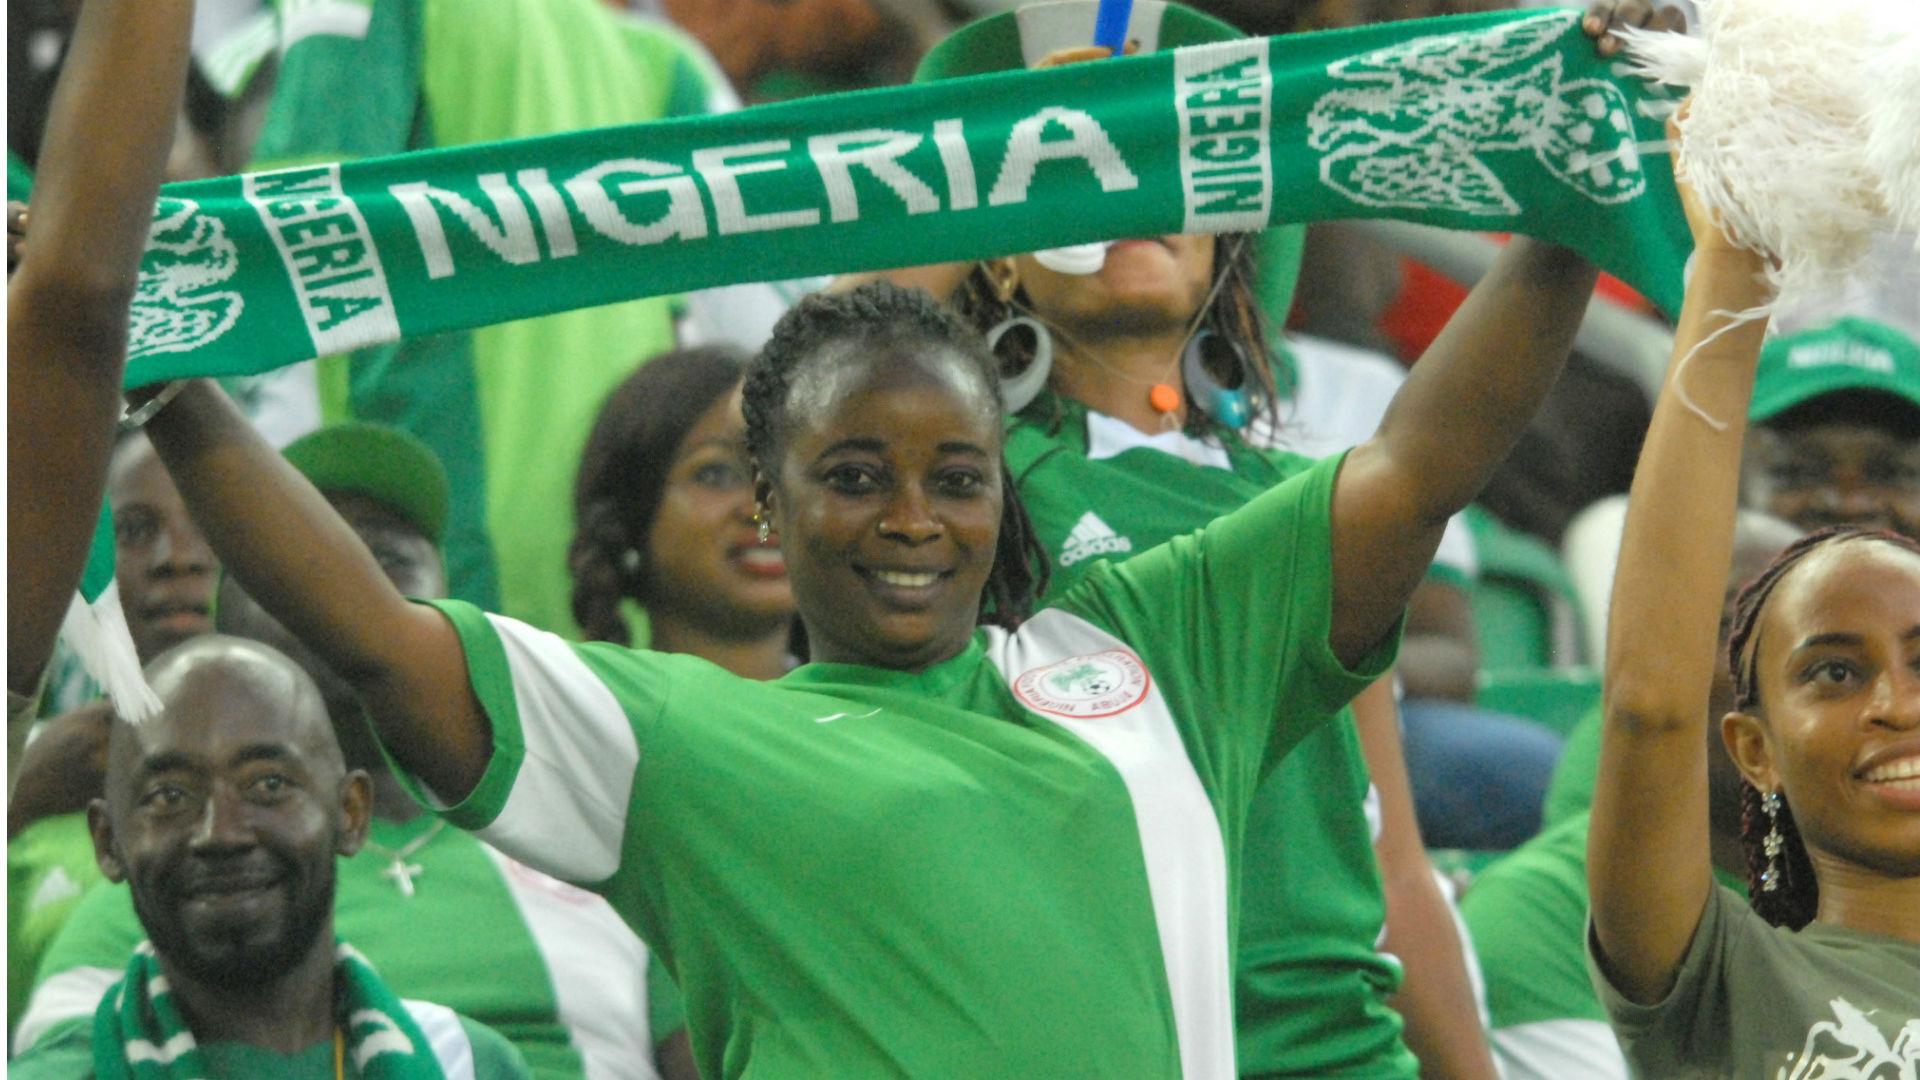 Download Cameroon World Cup 2018 - nigeria-fans_1v7izbltfx81x1n5rtdyto9lbq  Gallery_589012 .jpg?t\u003d-169592730